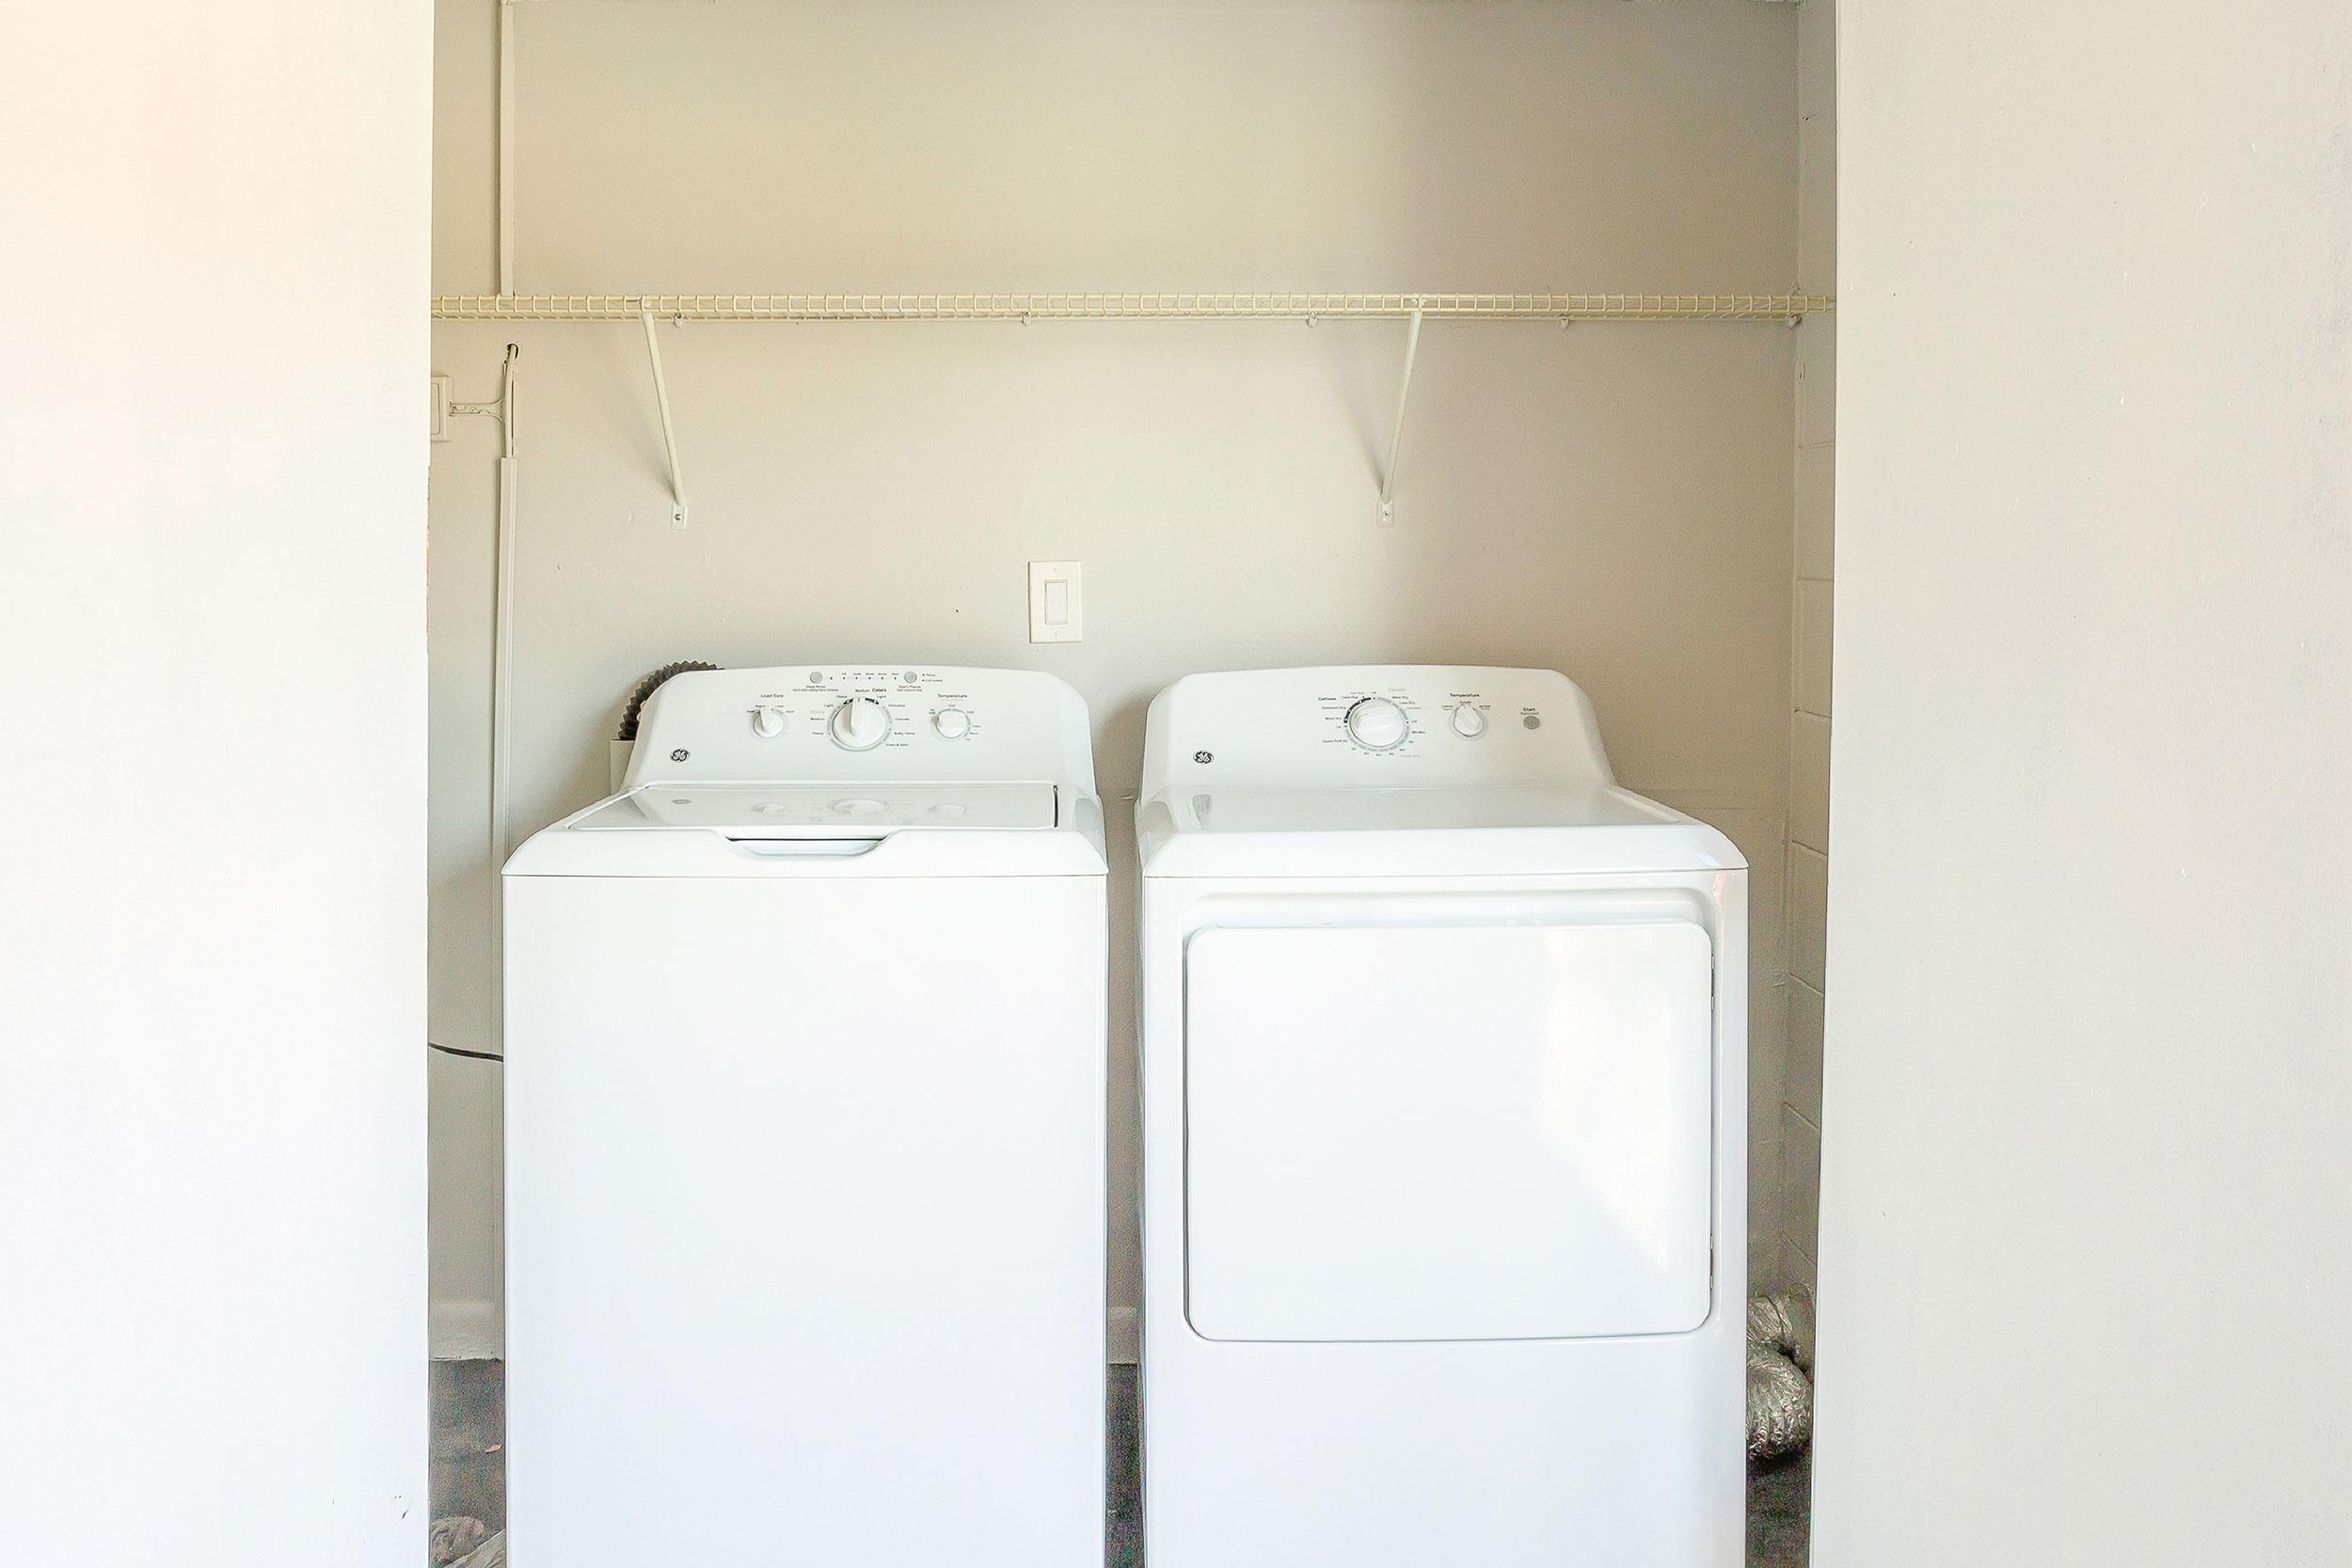 Arb-laundry